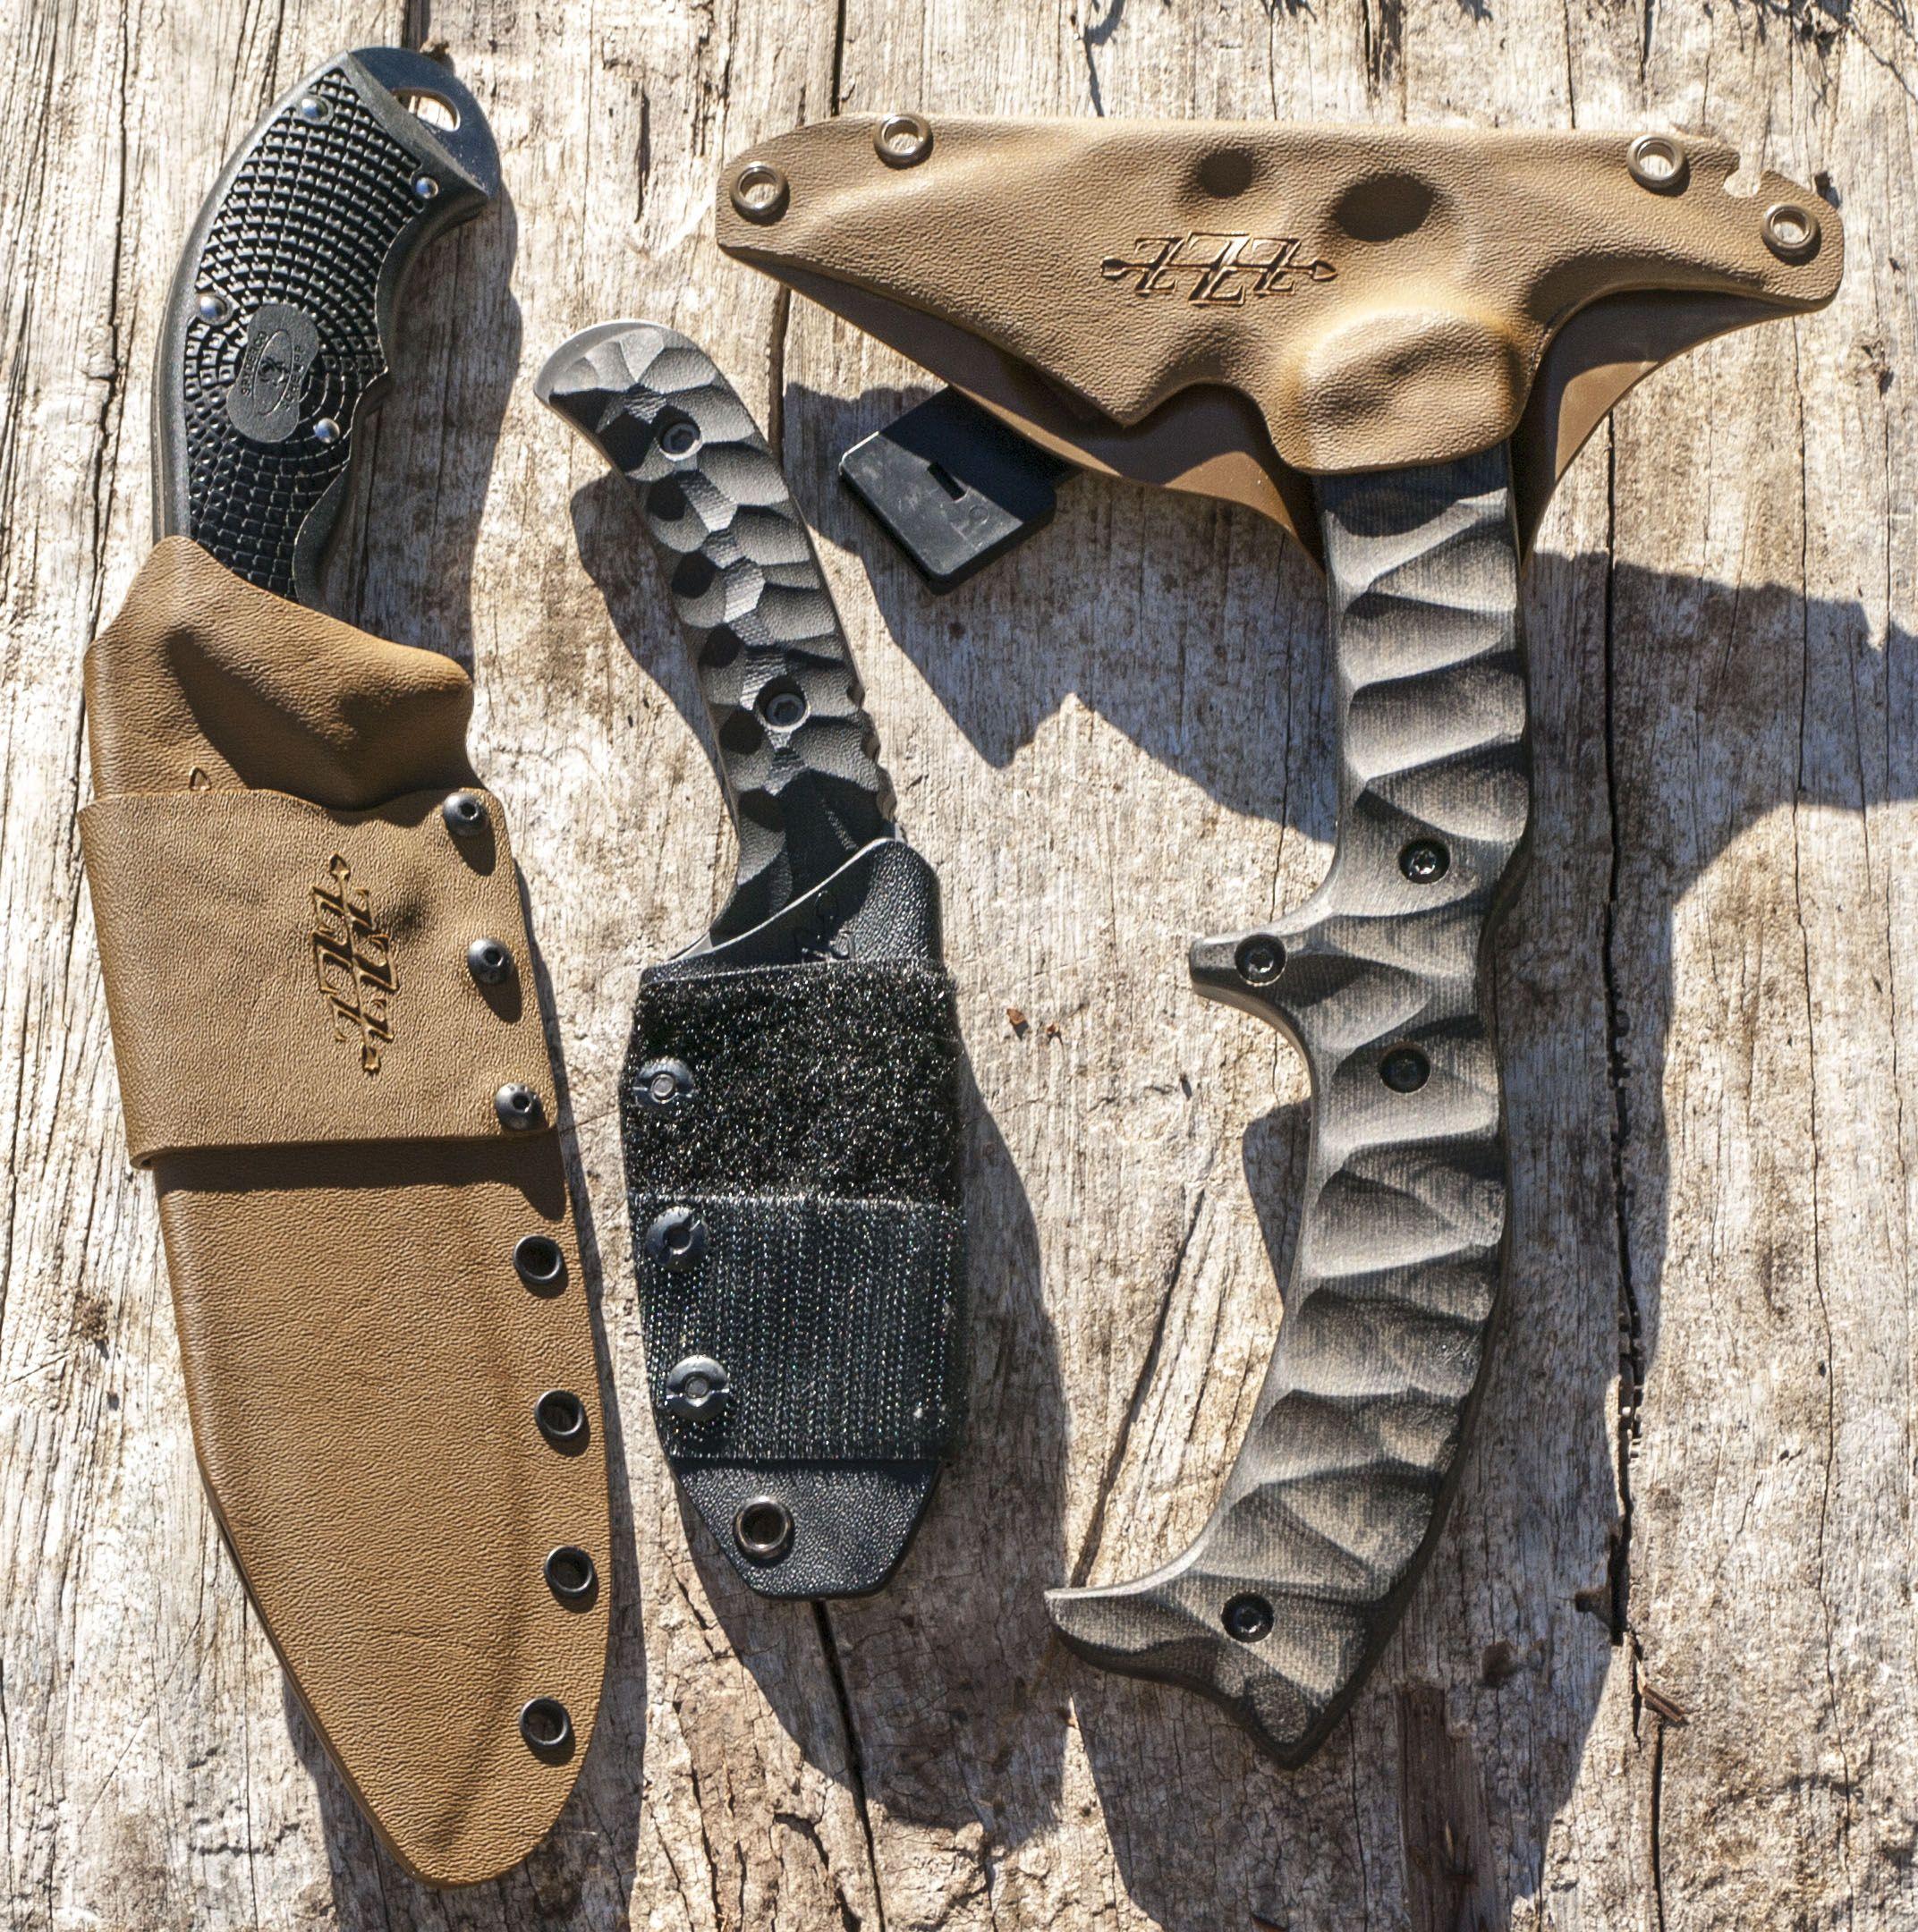 Kydex Knife Sheath: Custom Made Kydex Sheaths. @zzzcustomholsters #kydex